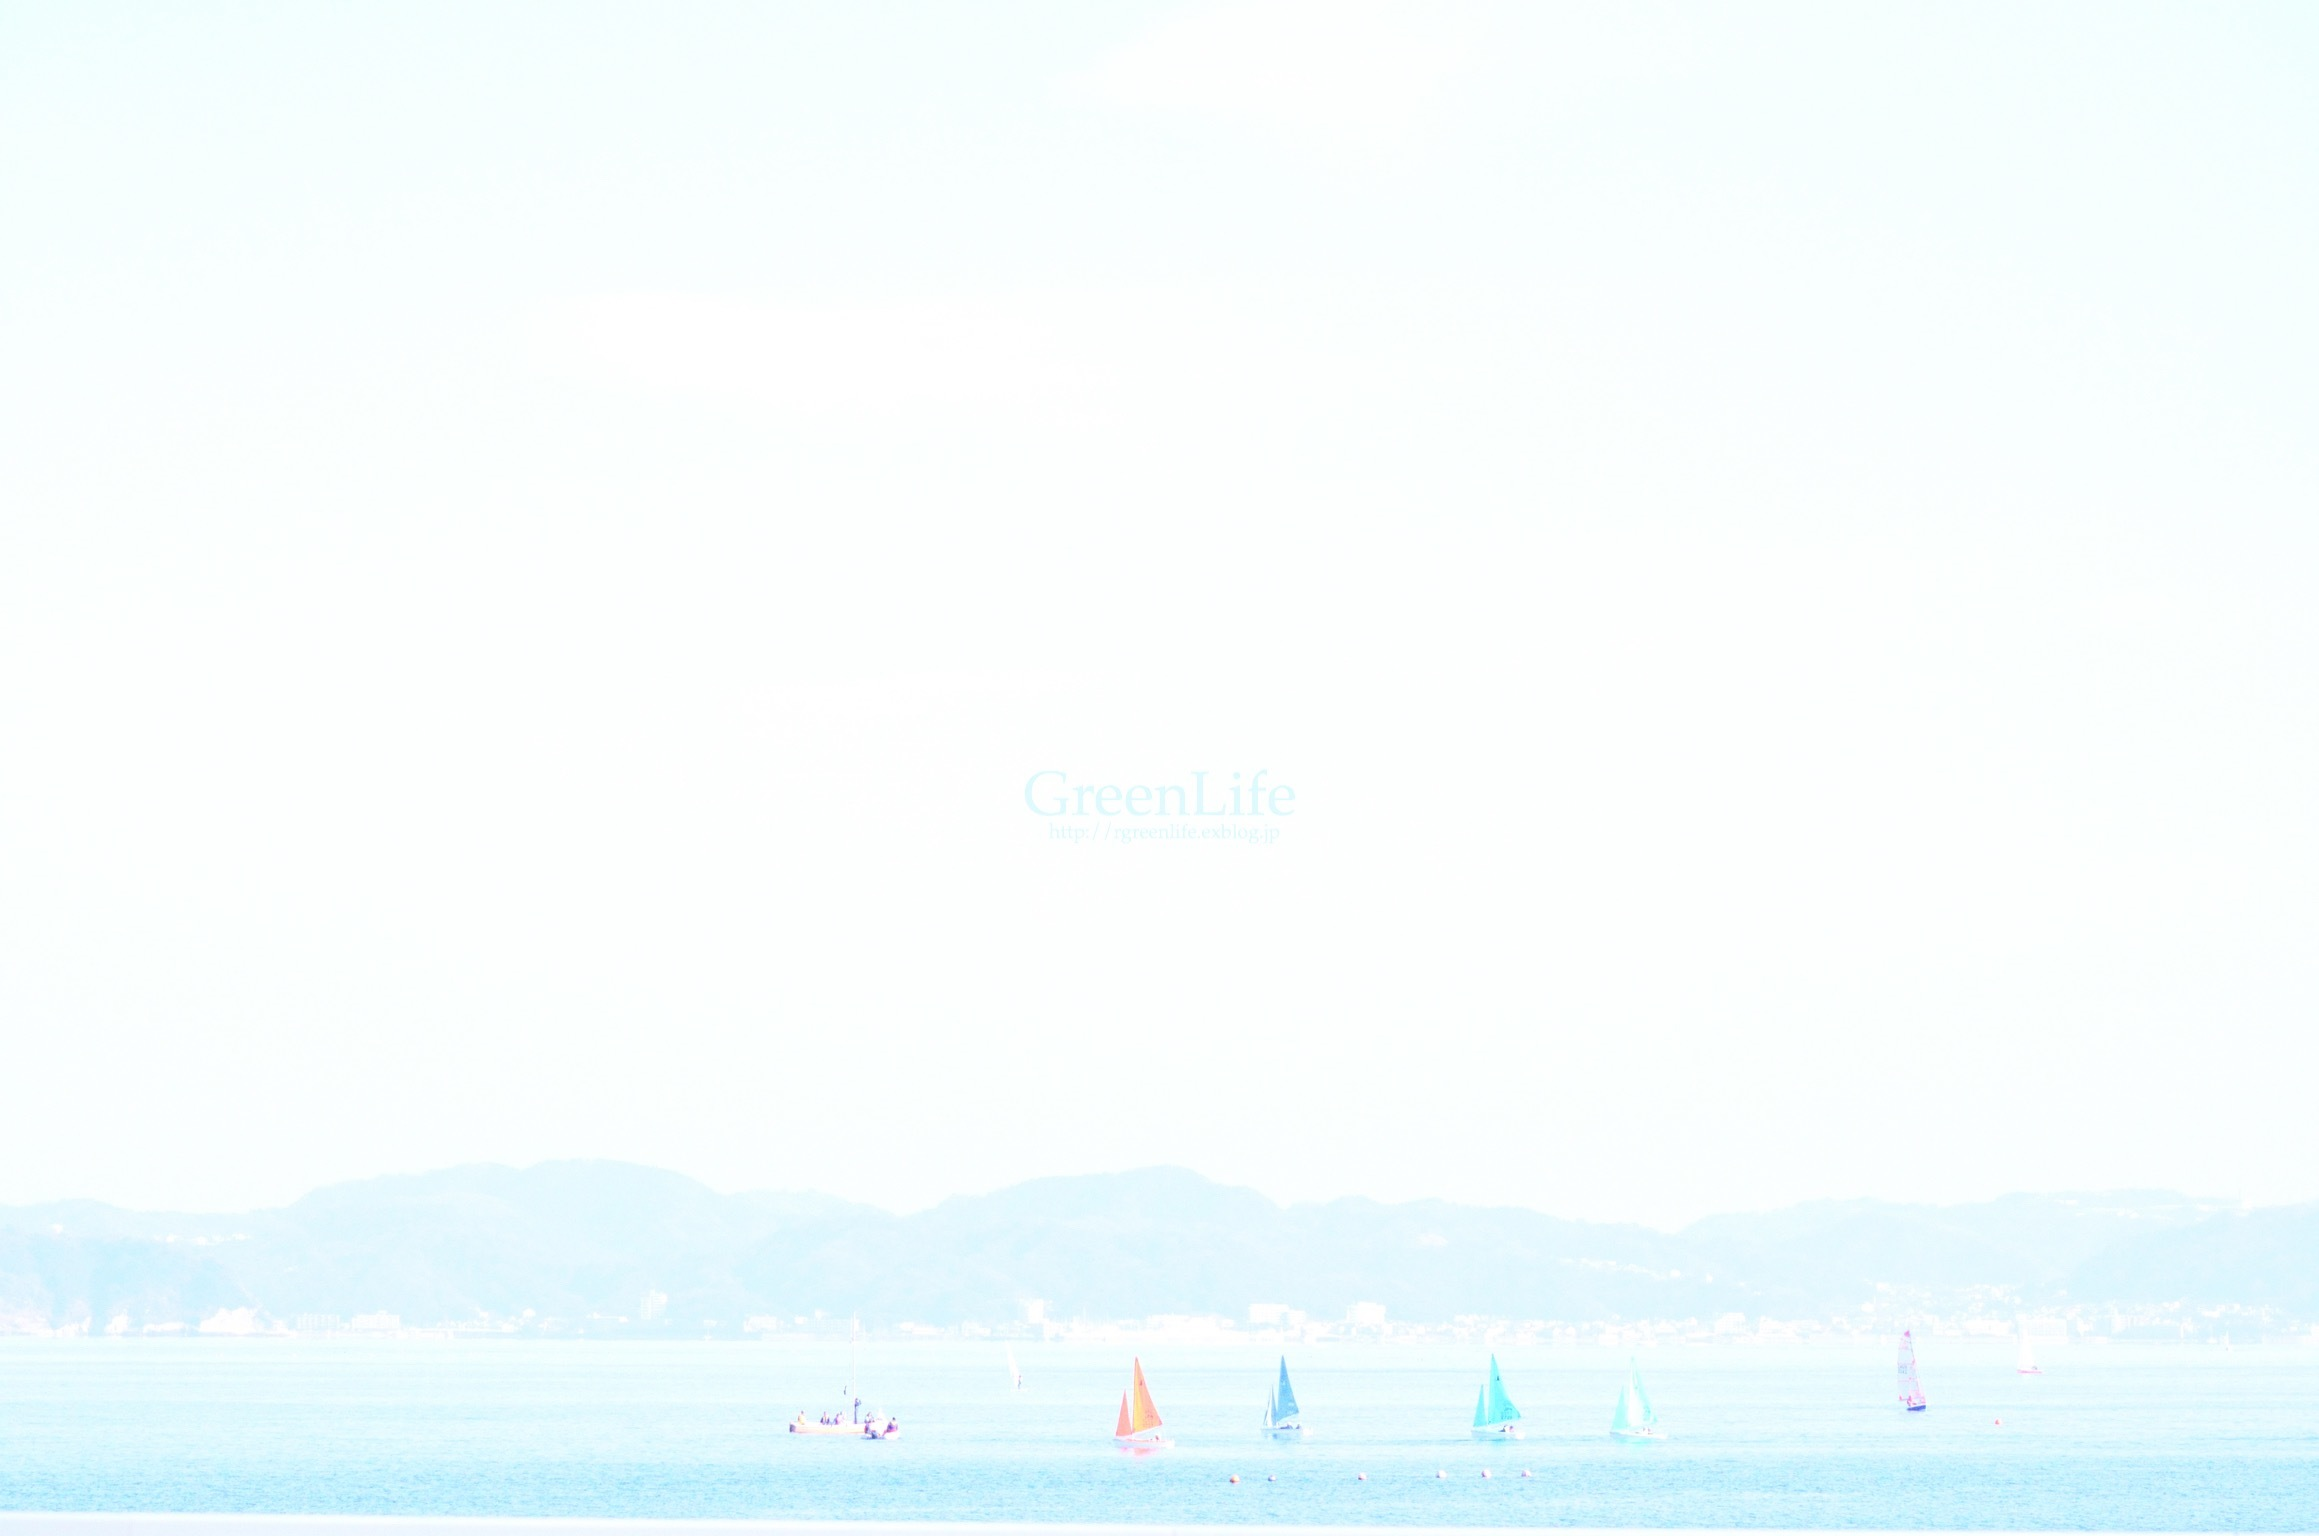 冬の海散歩_f0321522_10544036.jpg